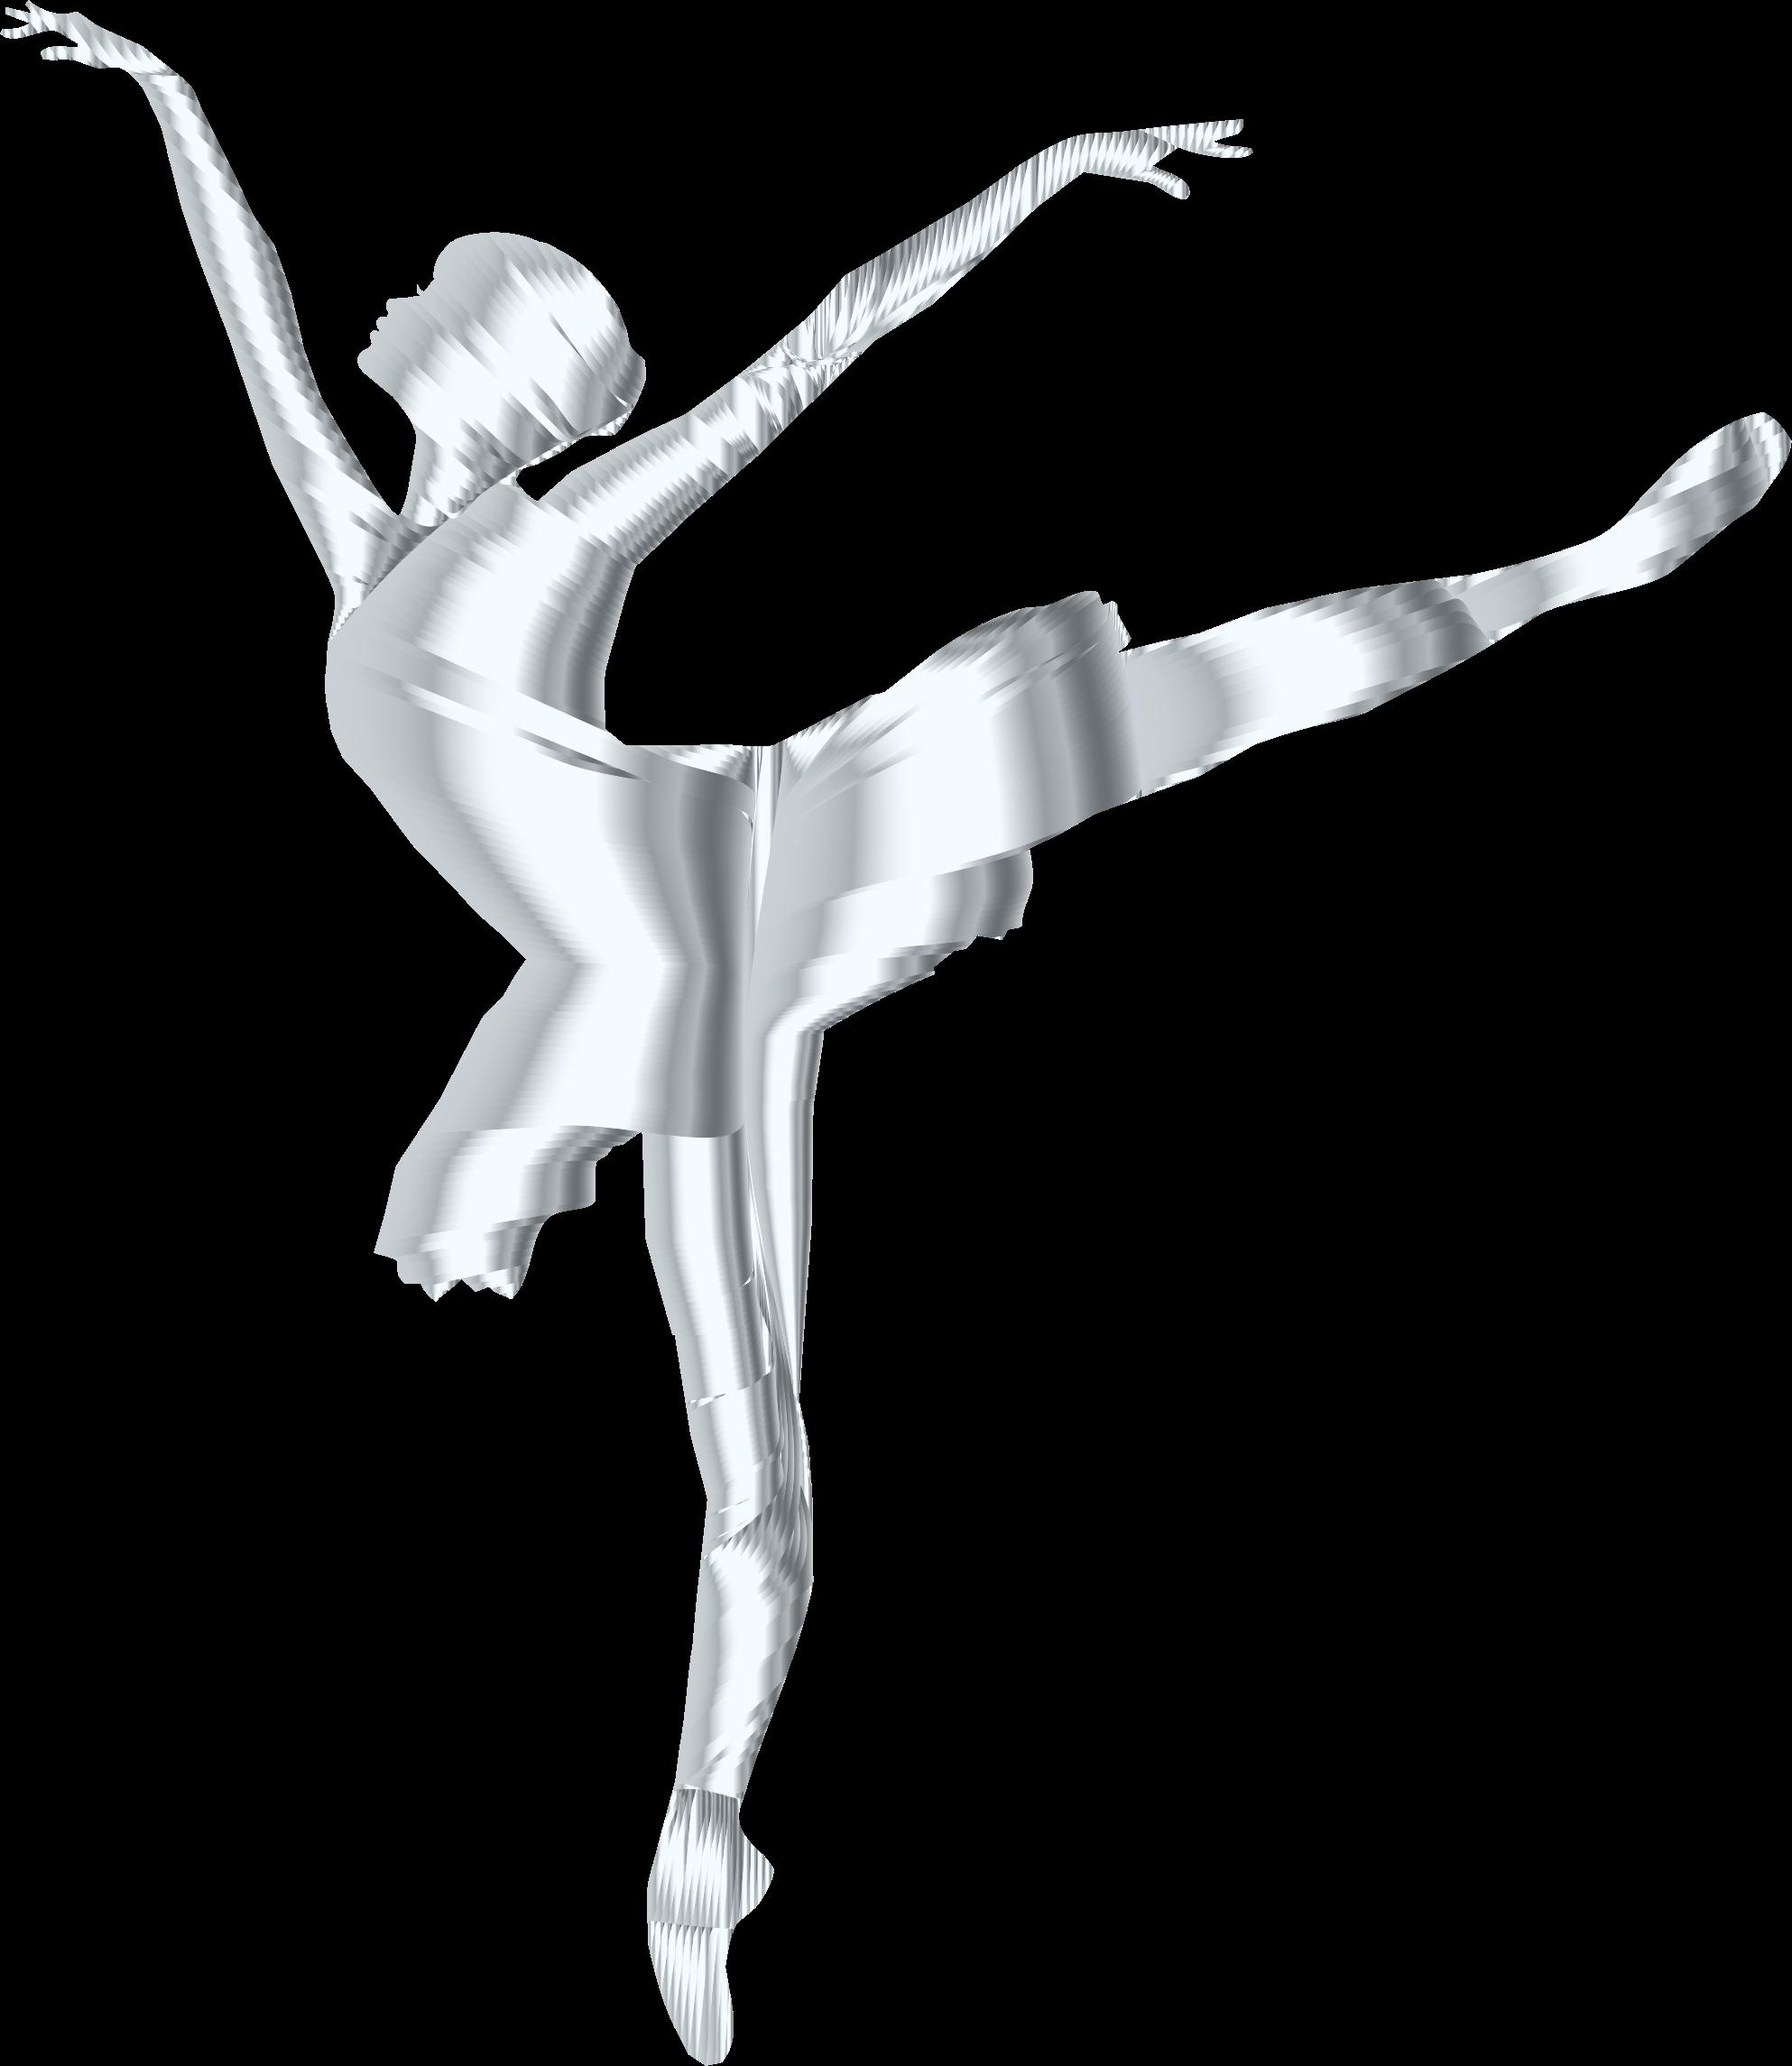 Silver graceful ballerina silhouette. Dance clipart modern dance